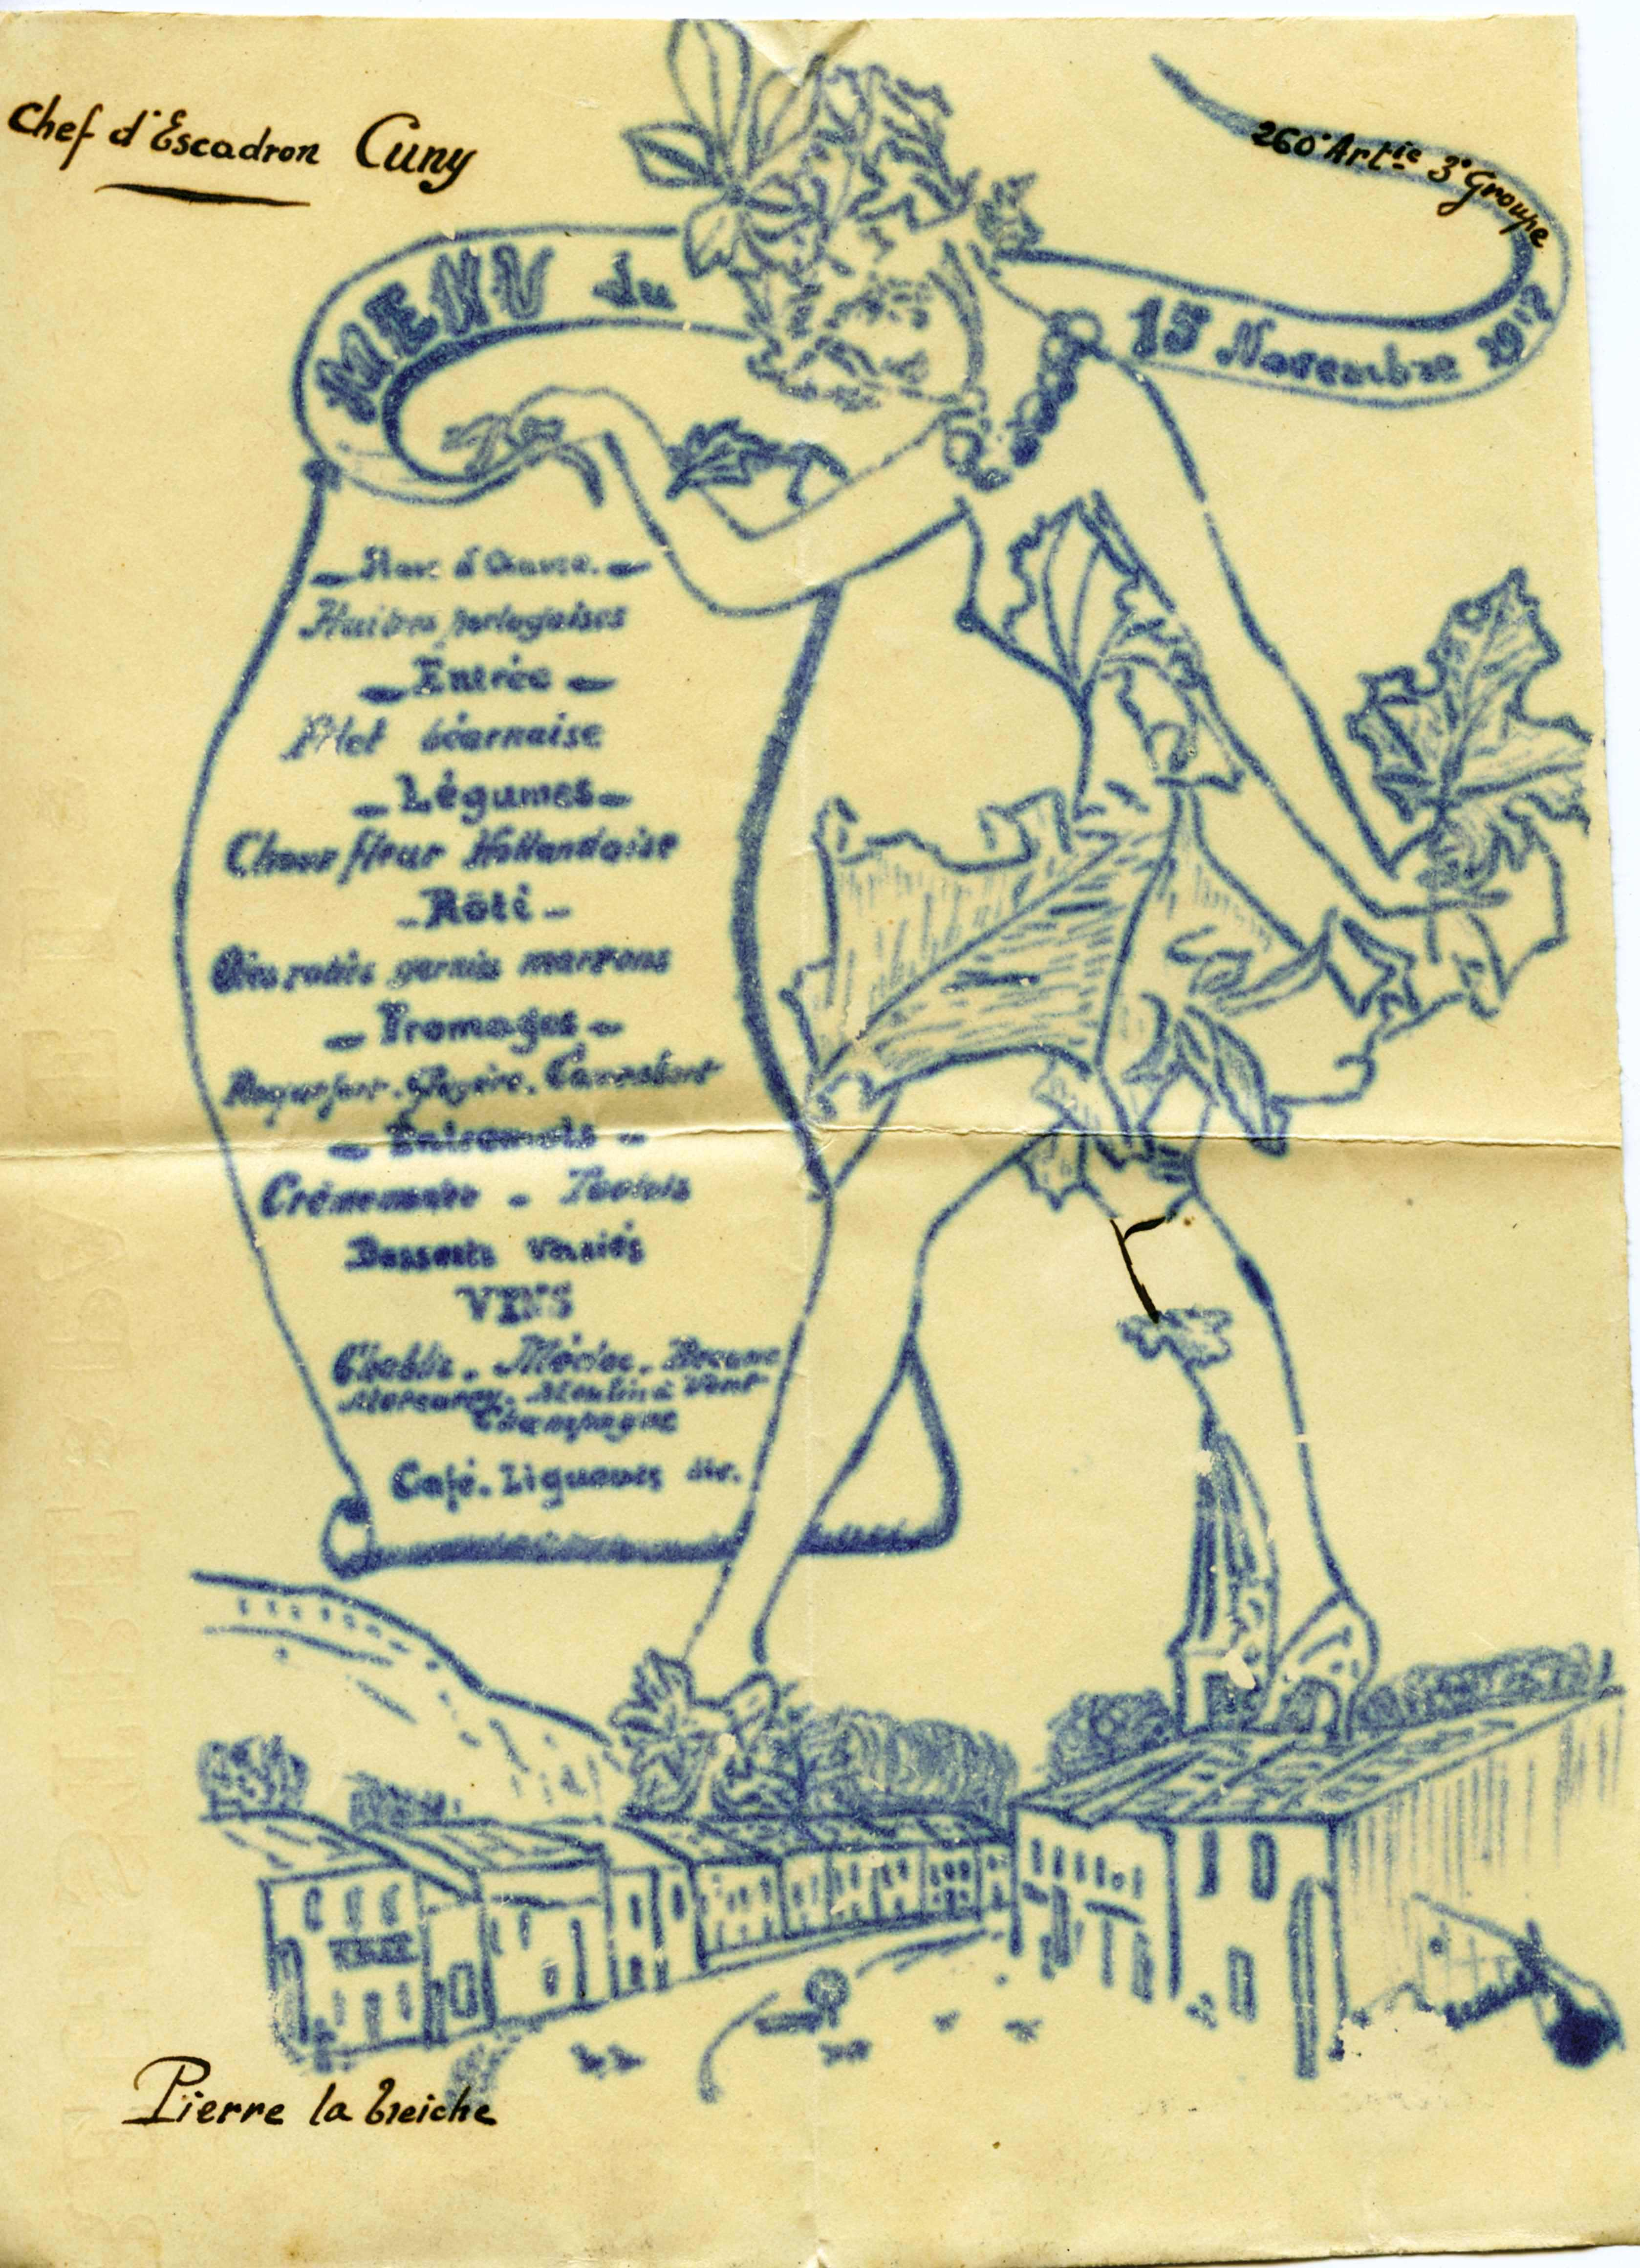 1918-1-GC Menu 15-11-18-018 Corrigee.jpg